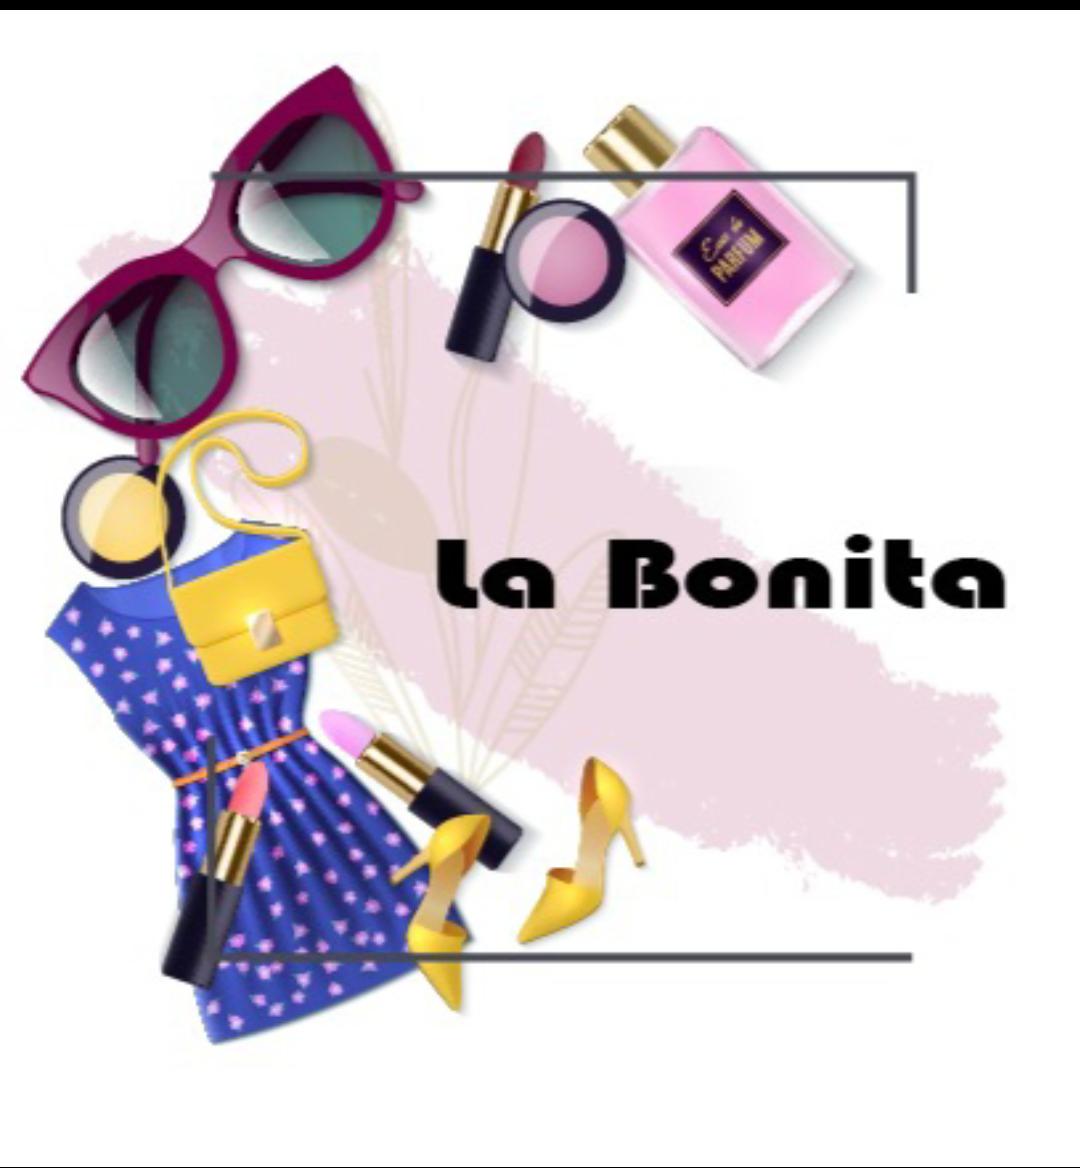 Labonita company